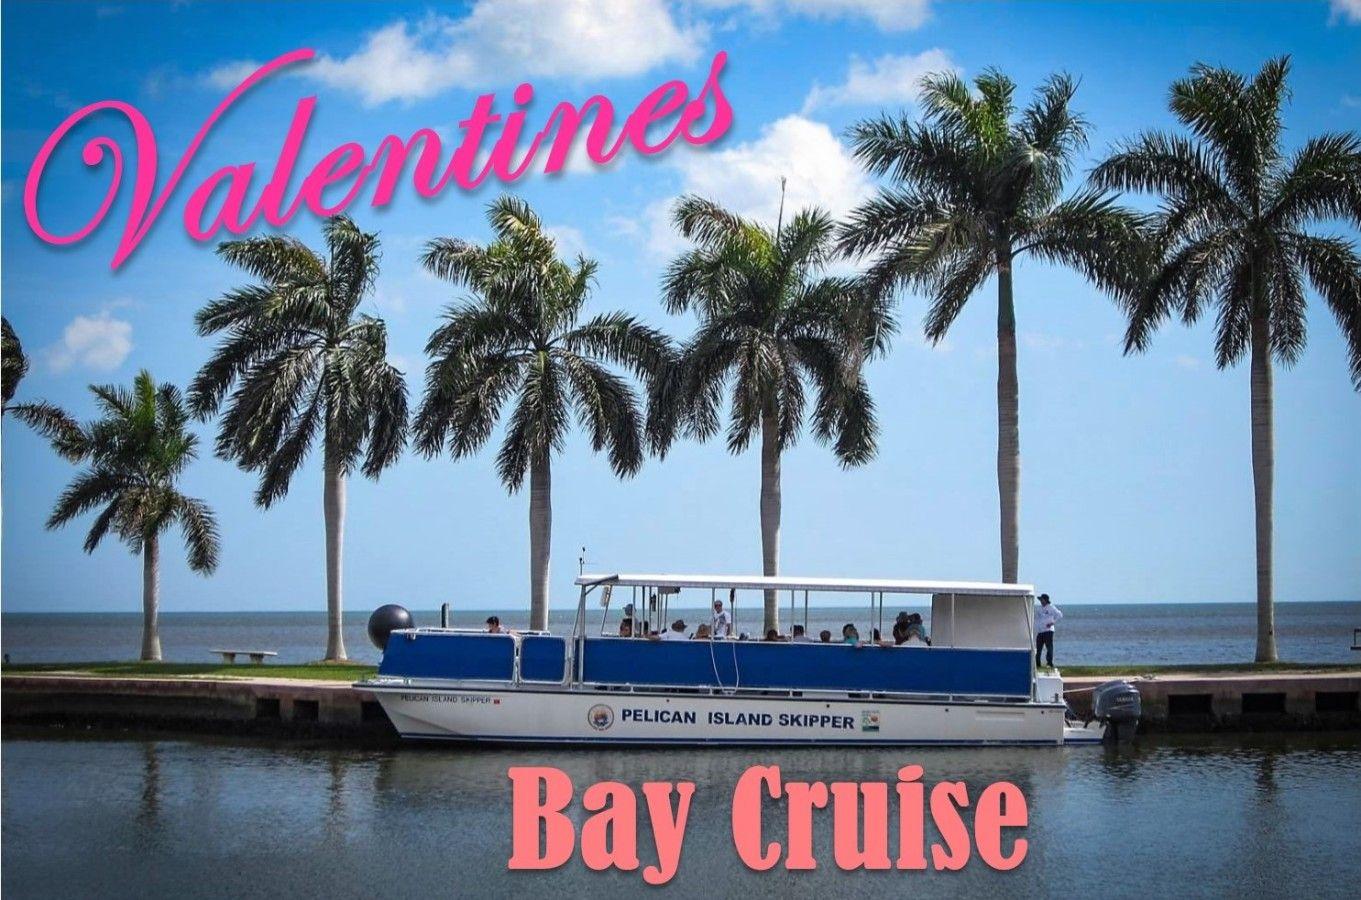 Valentines Bay Cruise